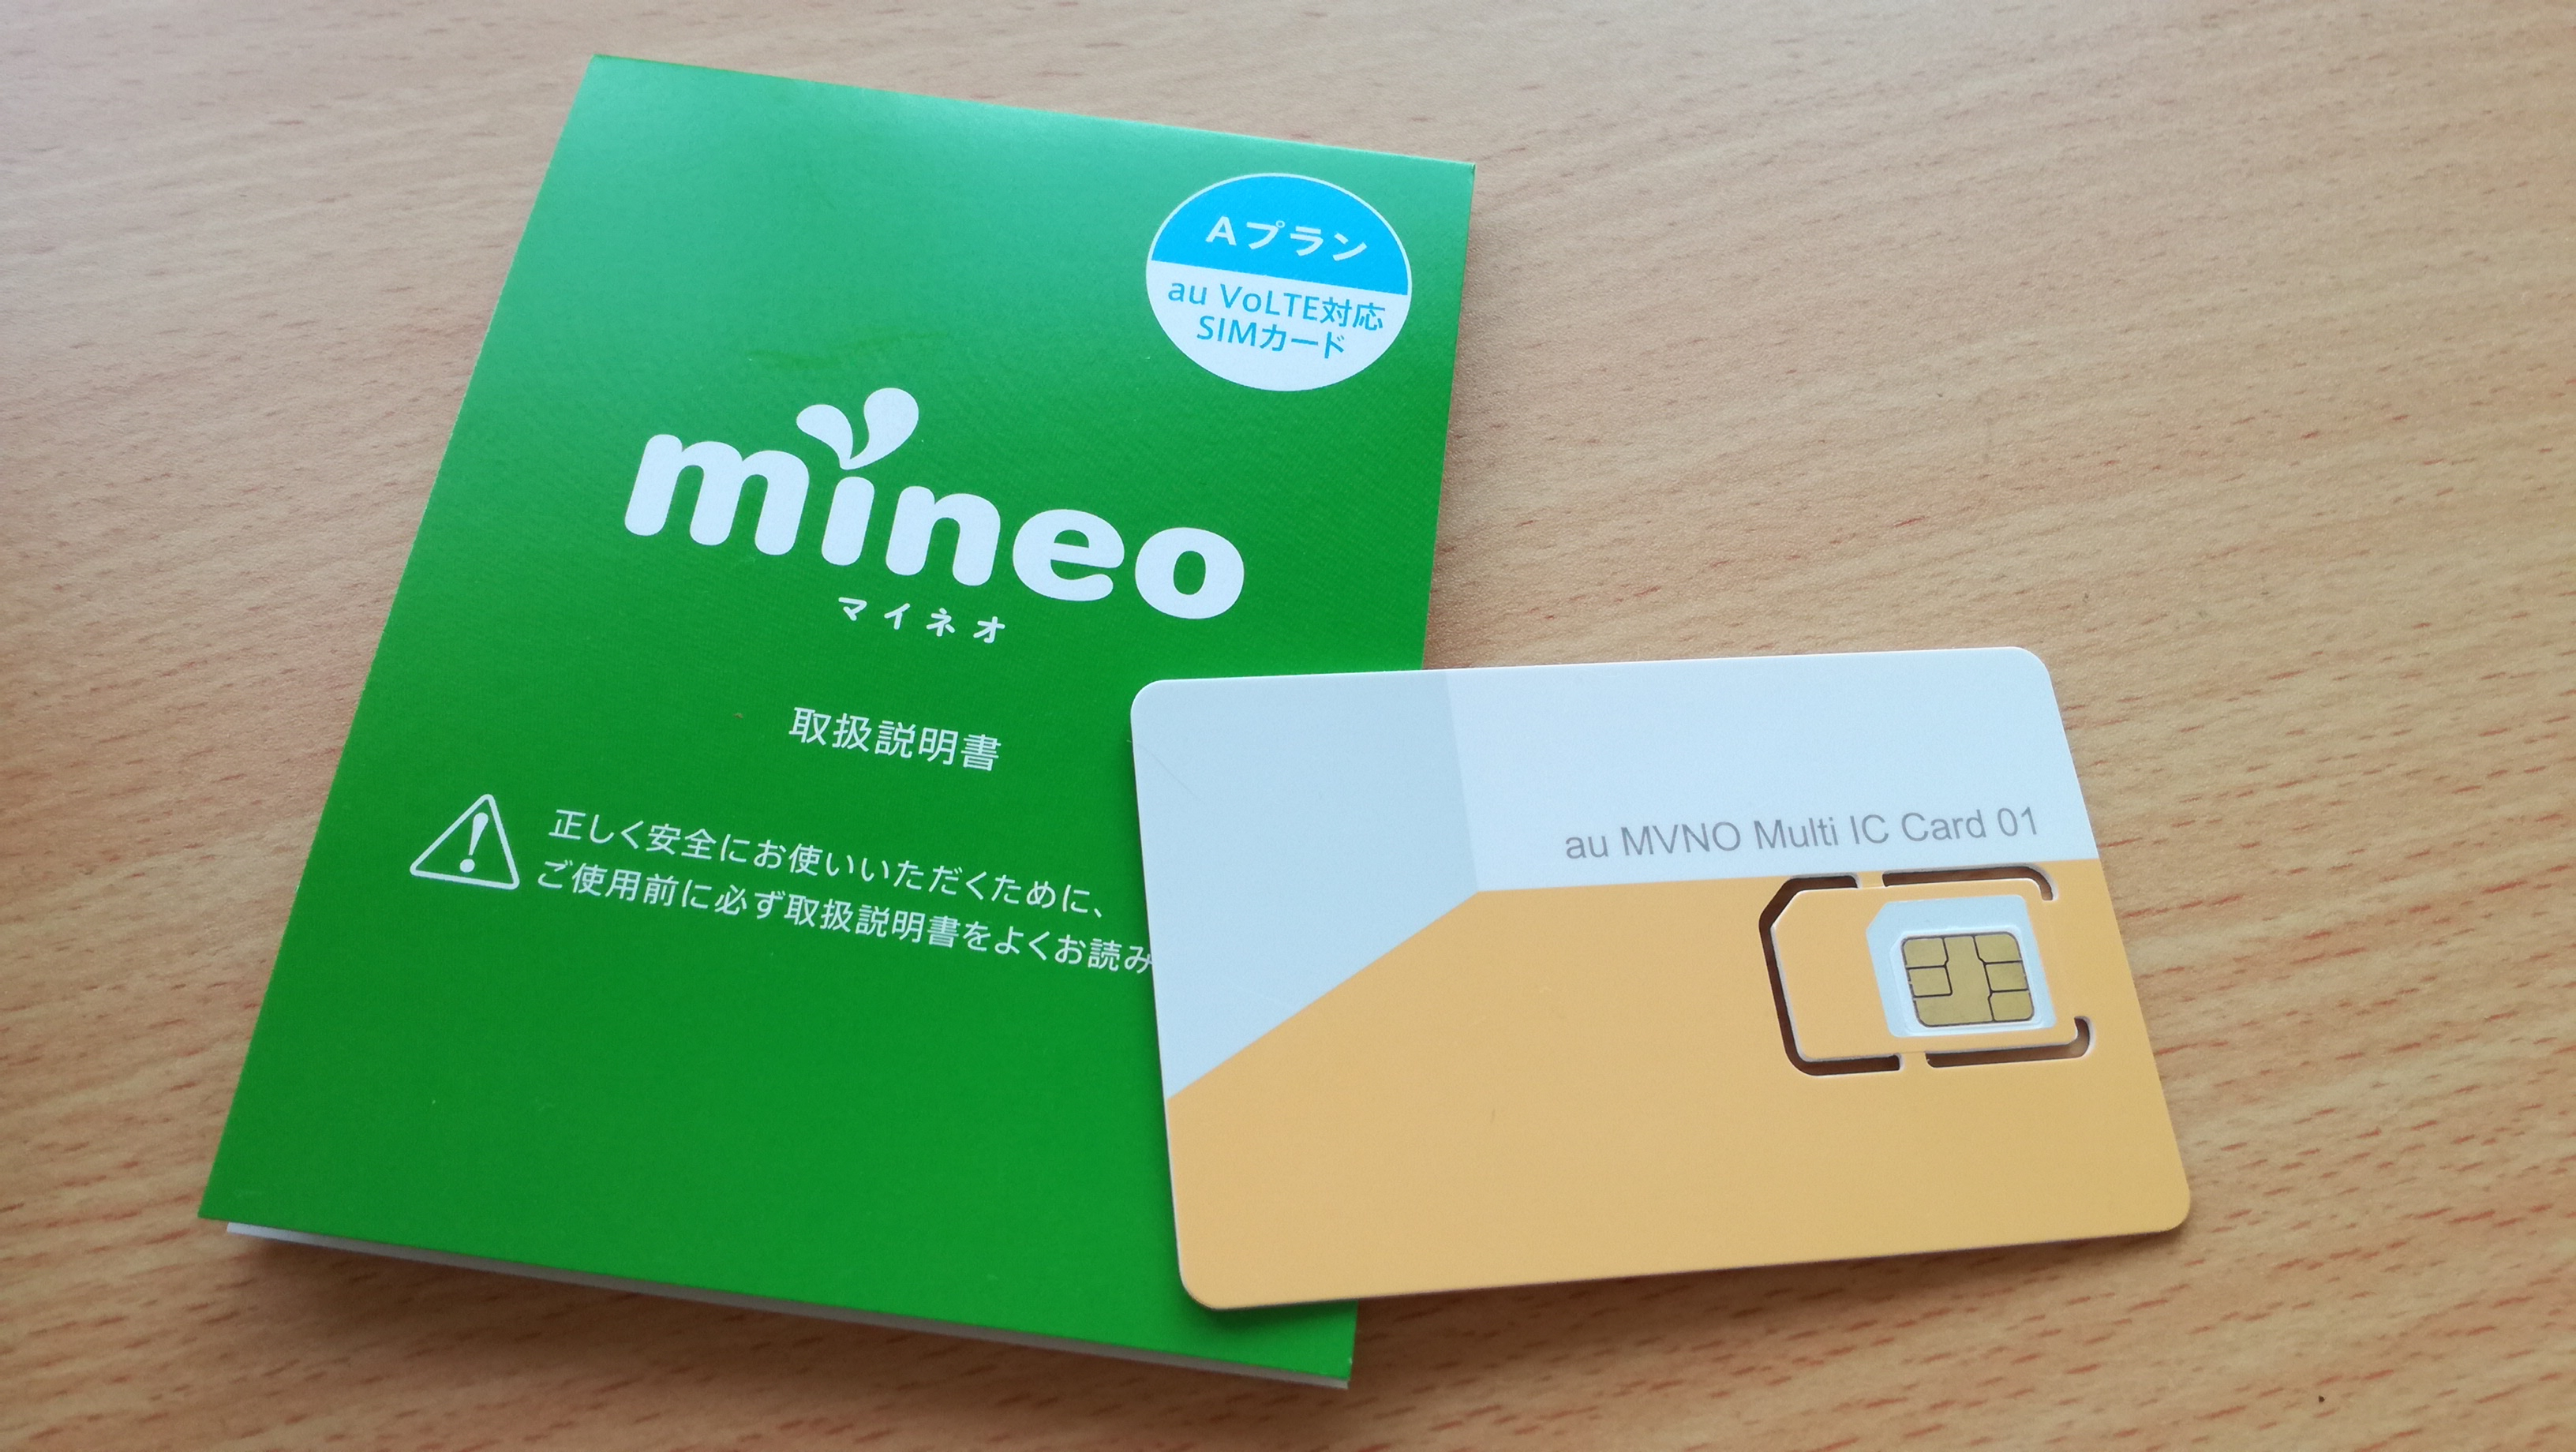 mineo(利用料金・オプション)